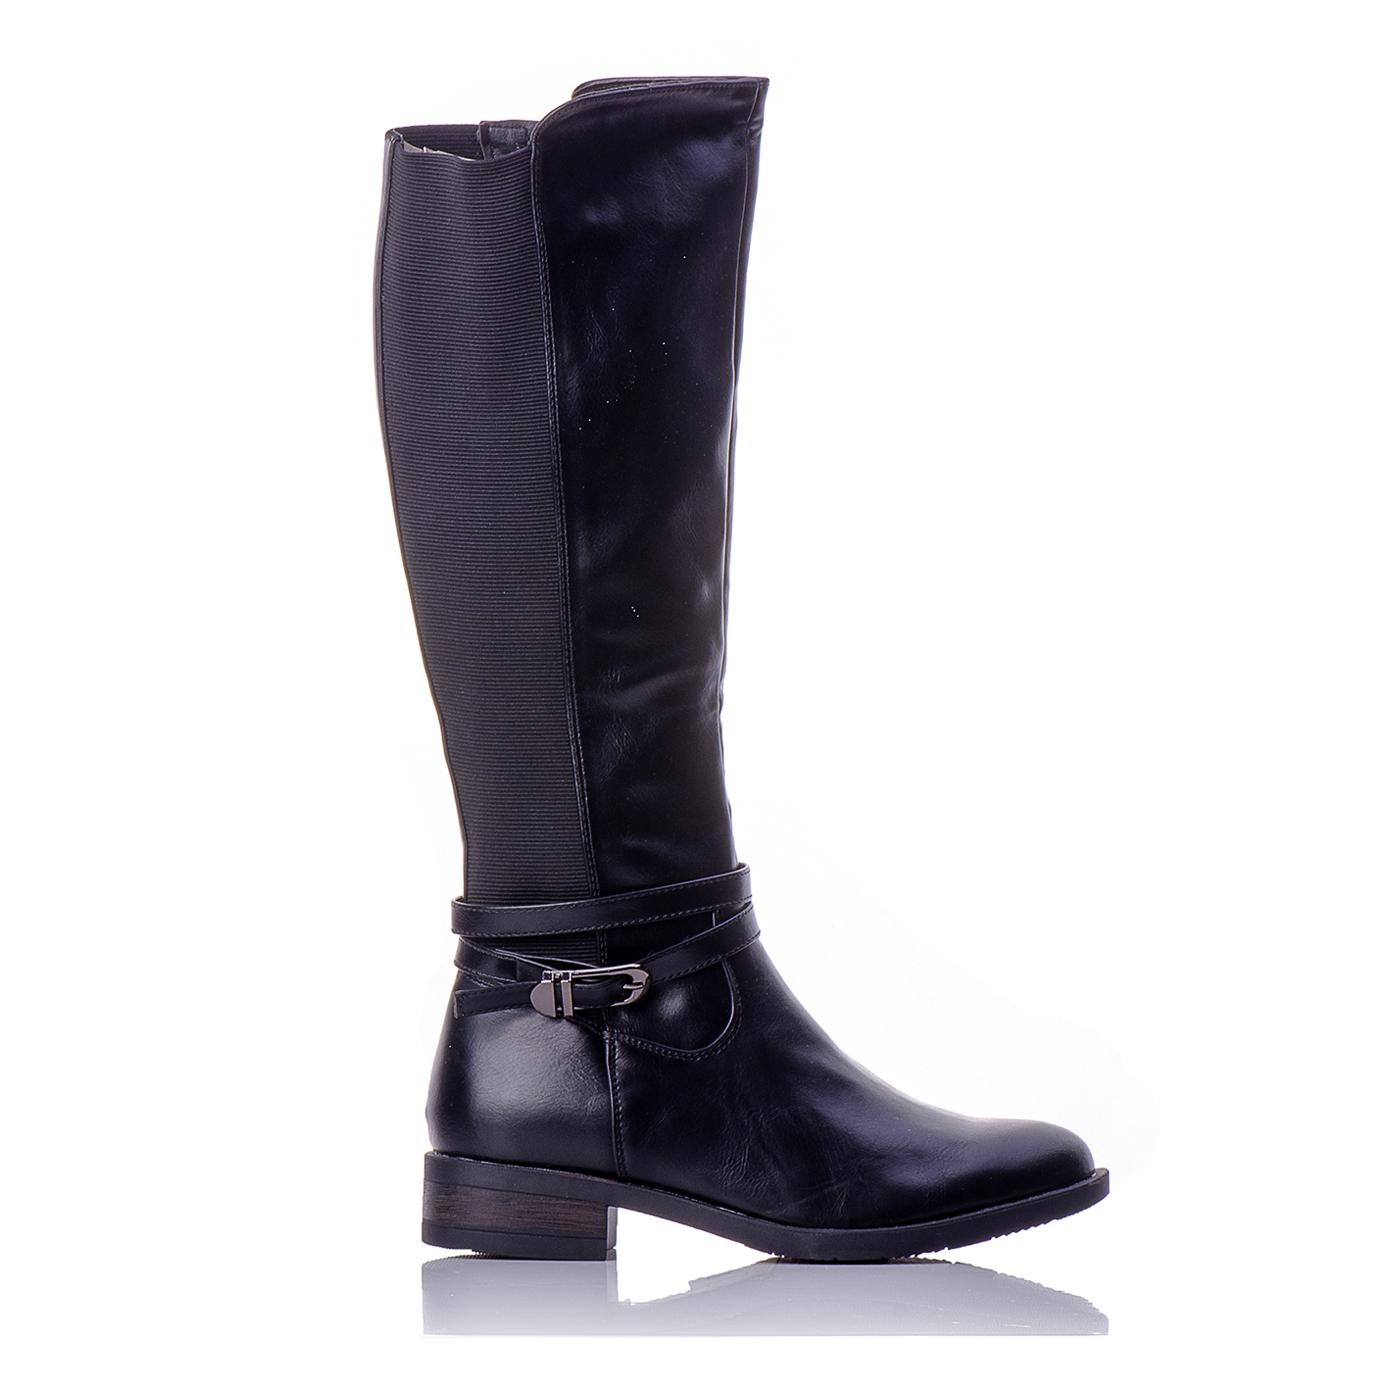 05040ff584e Μπότες Μαύρες Με Λάστιχο Στην Γάμπα Και Πλαϊνή Αγκράφα | BlackOut Shoes